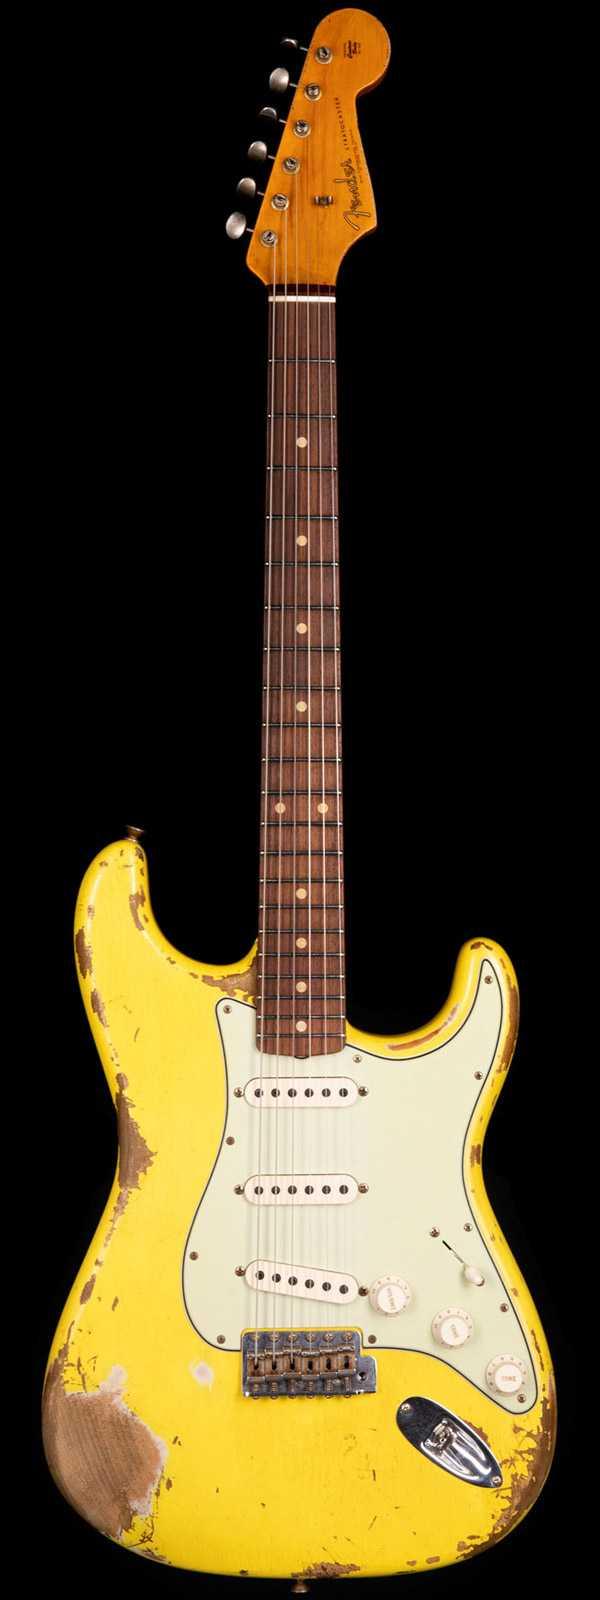 Fender Custom Shop 1961 Stratocaster Heavy Relic Graffiti Yellow